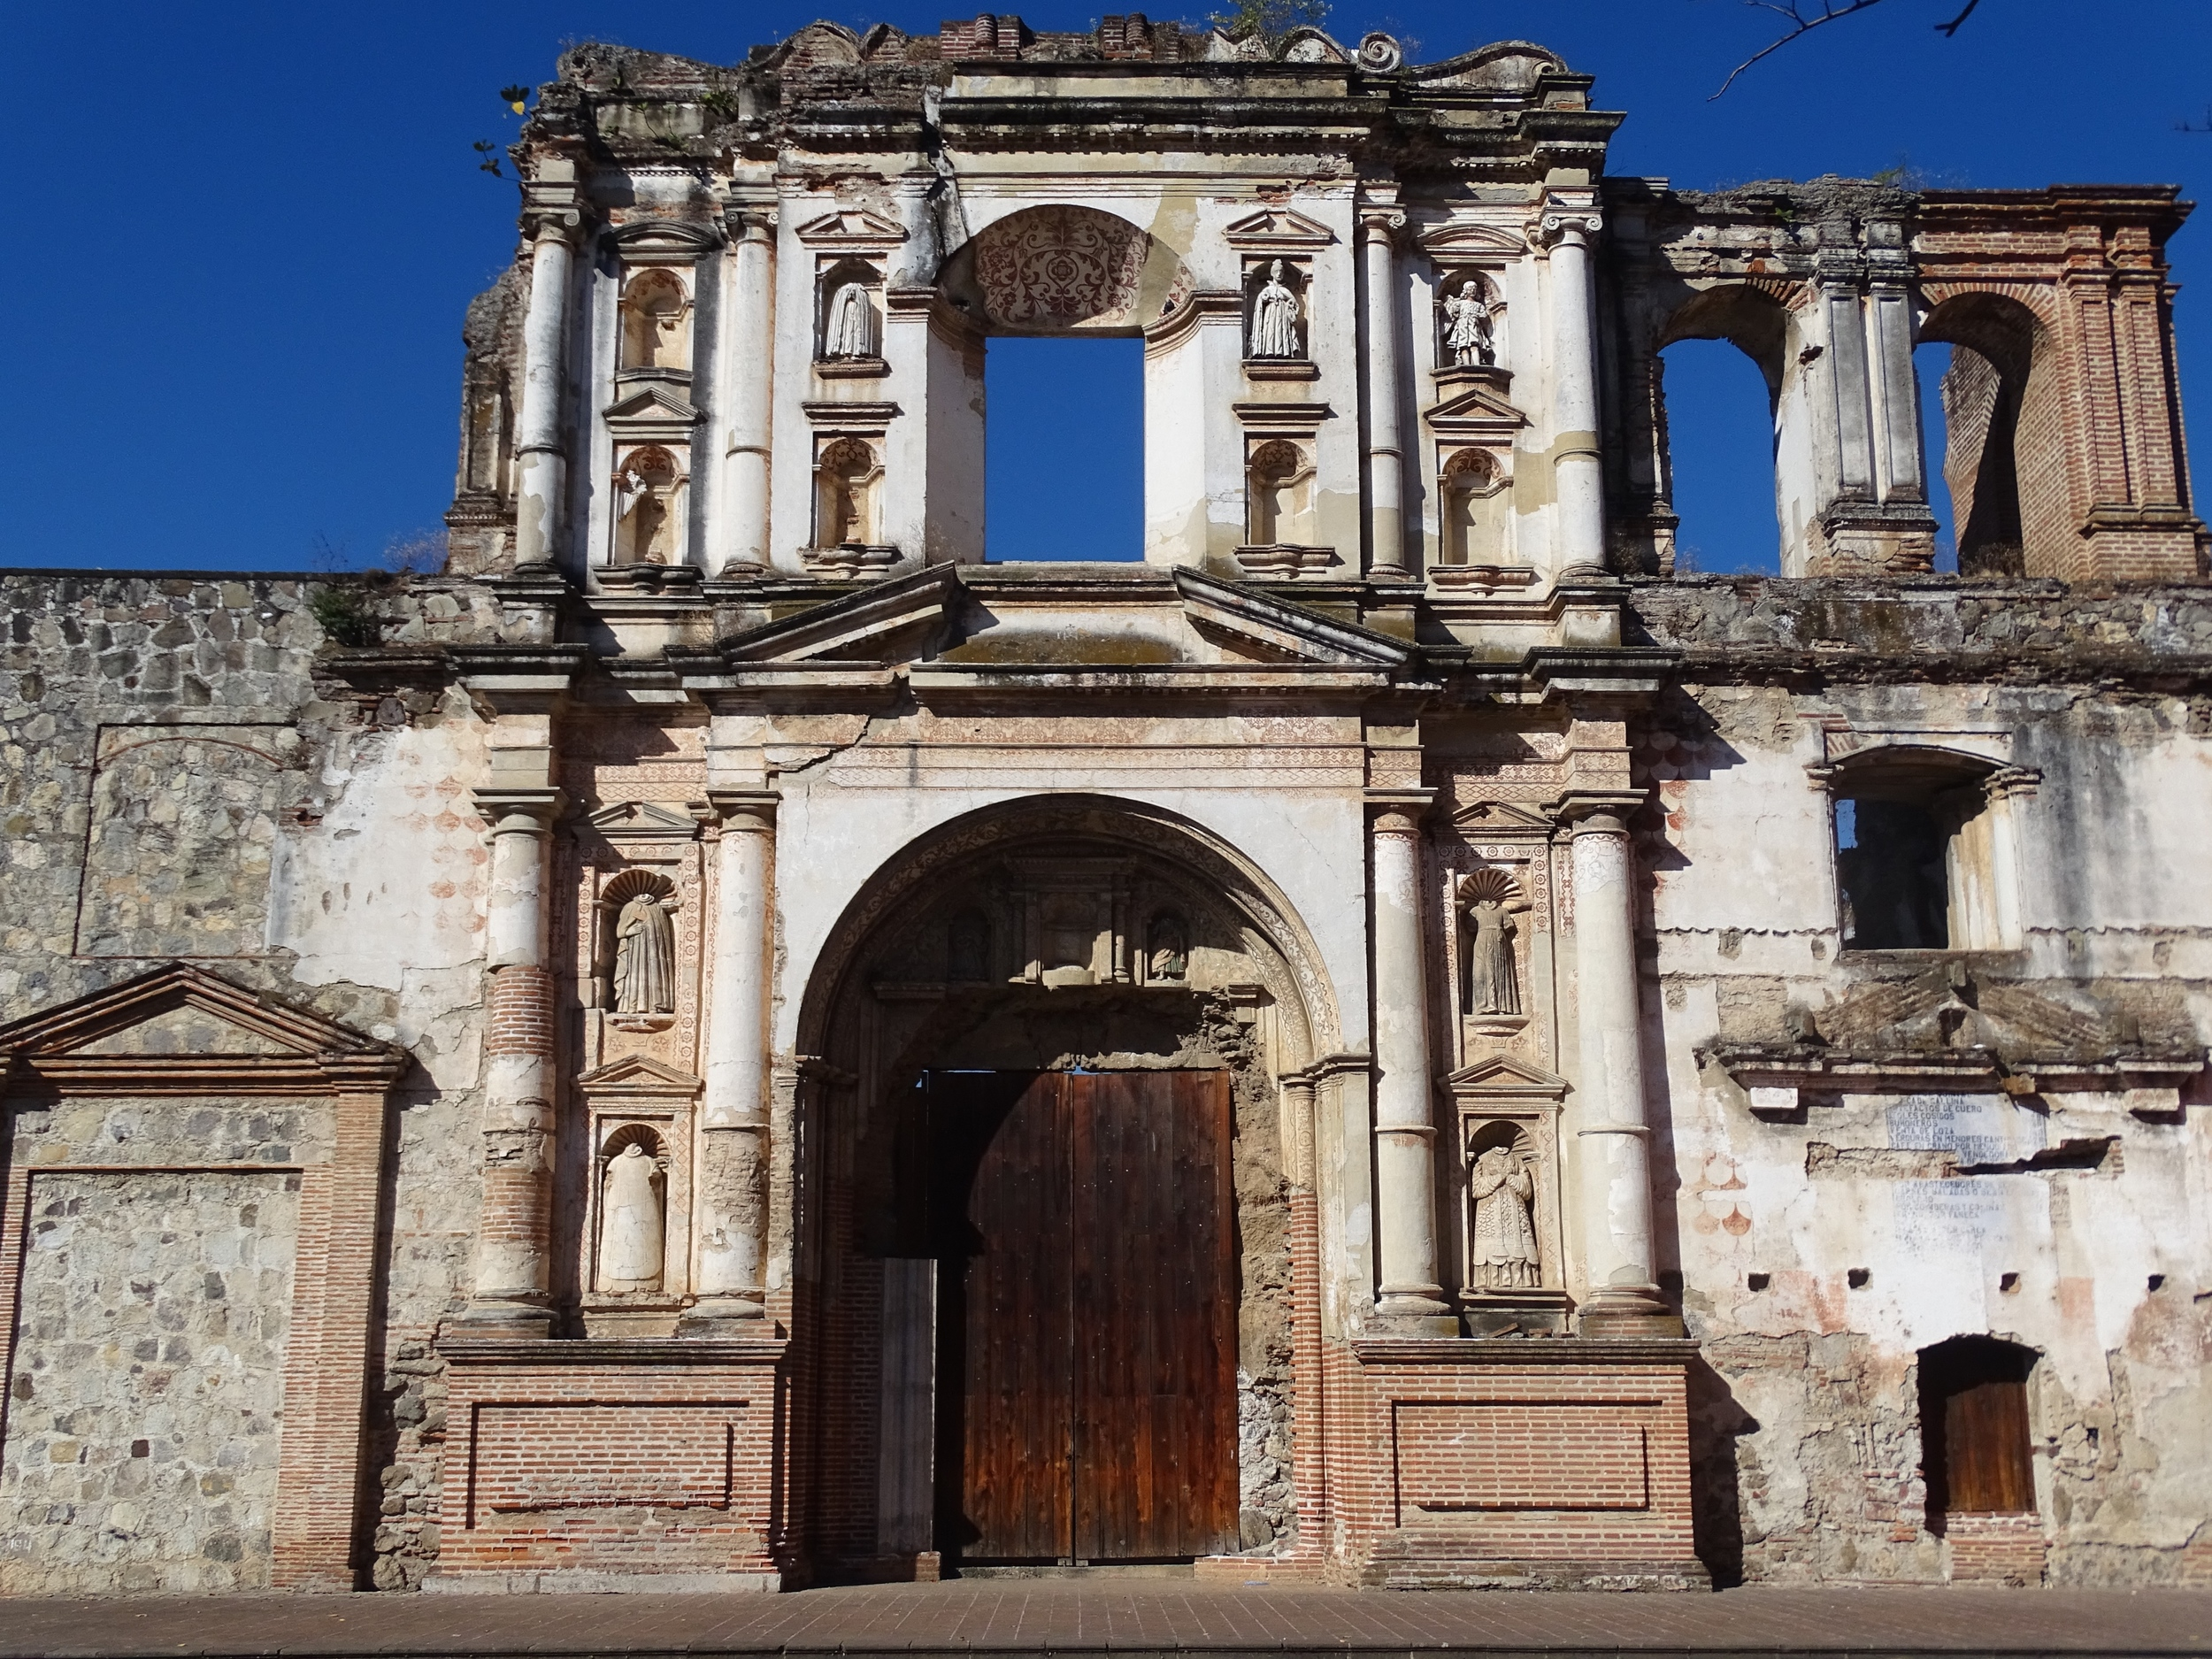 Antigua is a UNESCO World Heritage site so...